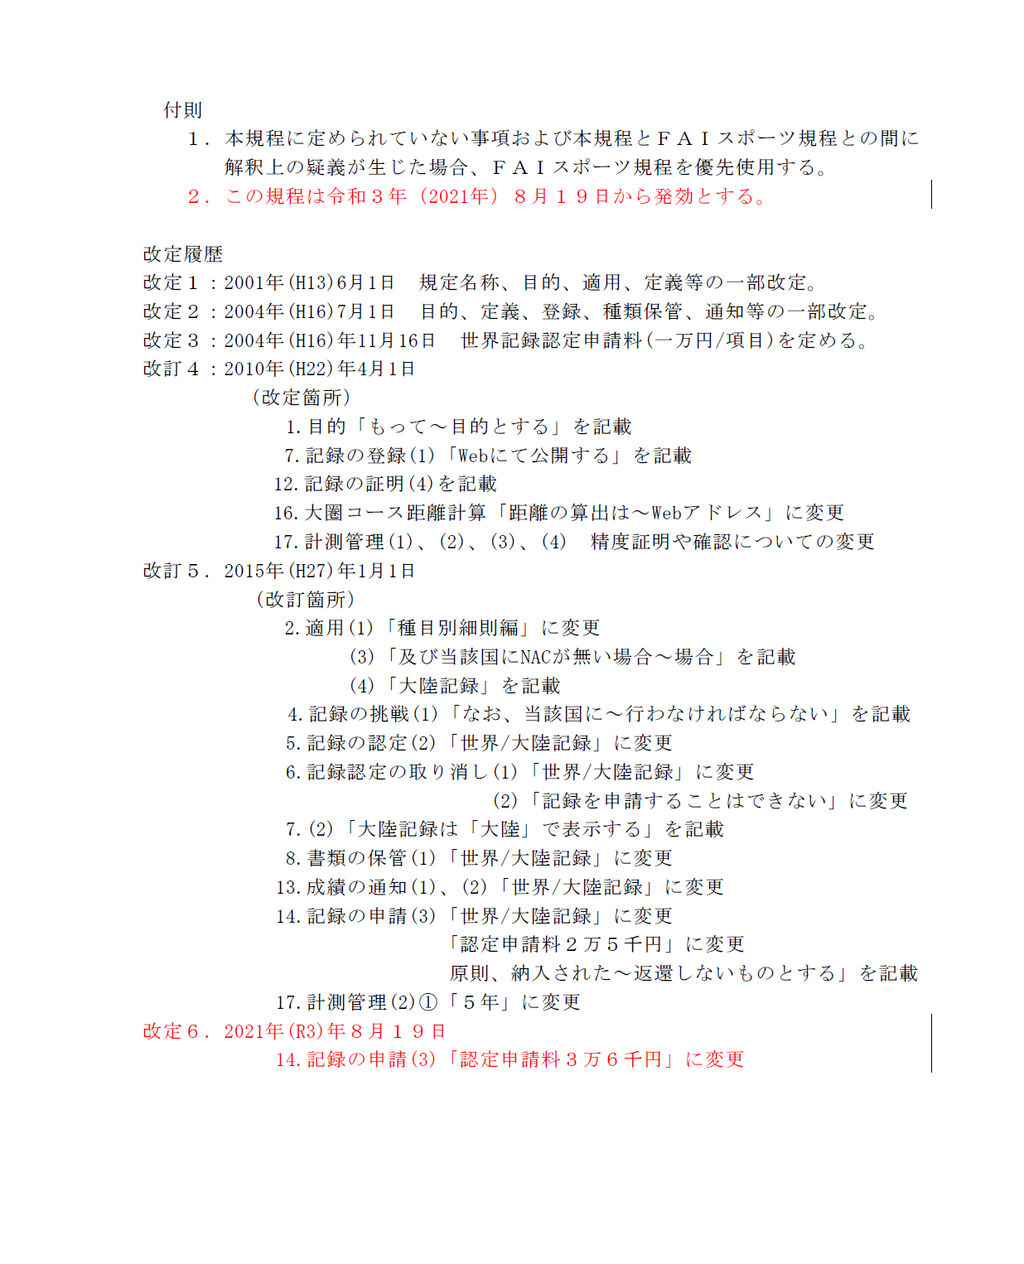 日本記録及び世界大陸記録の証明及び認定規程5